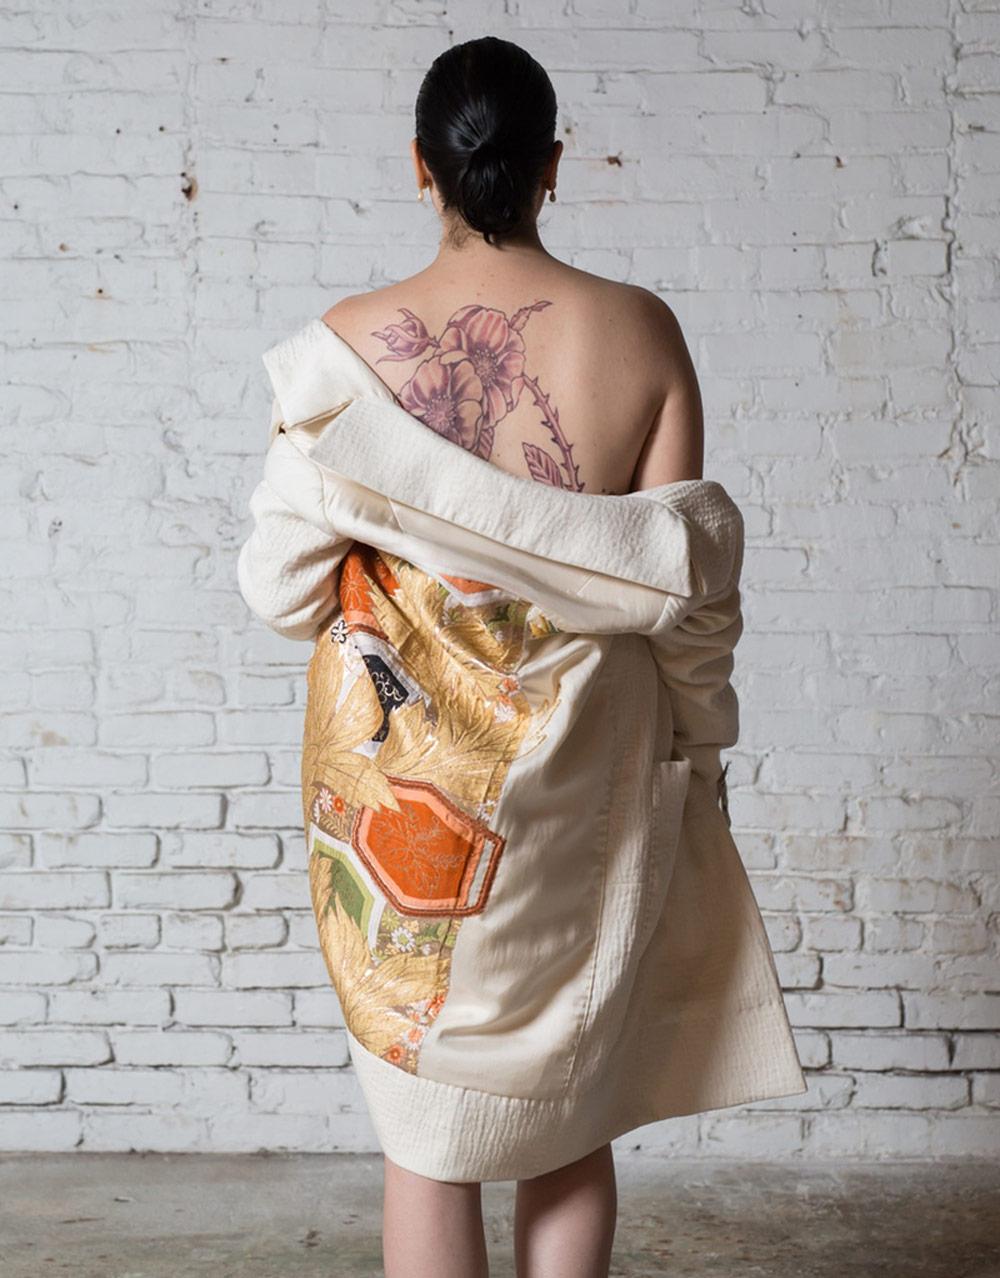 Zero Waste Fashion - Ø GLASS Zero Waste fashion clothing